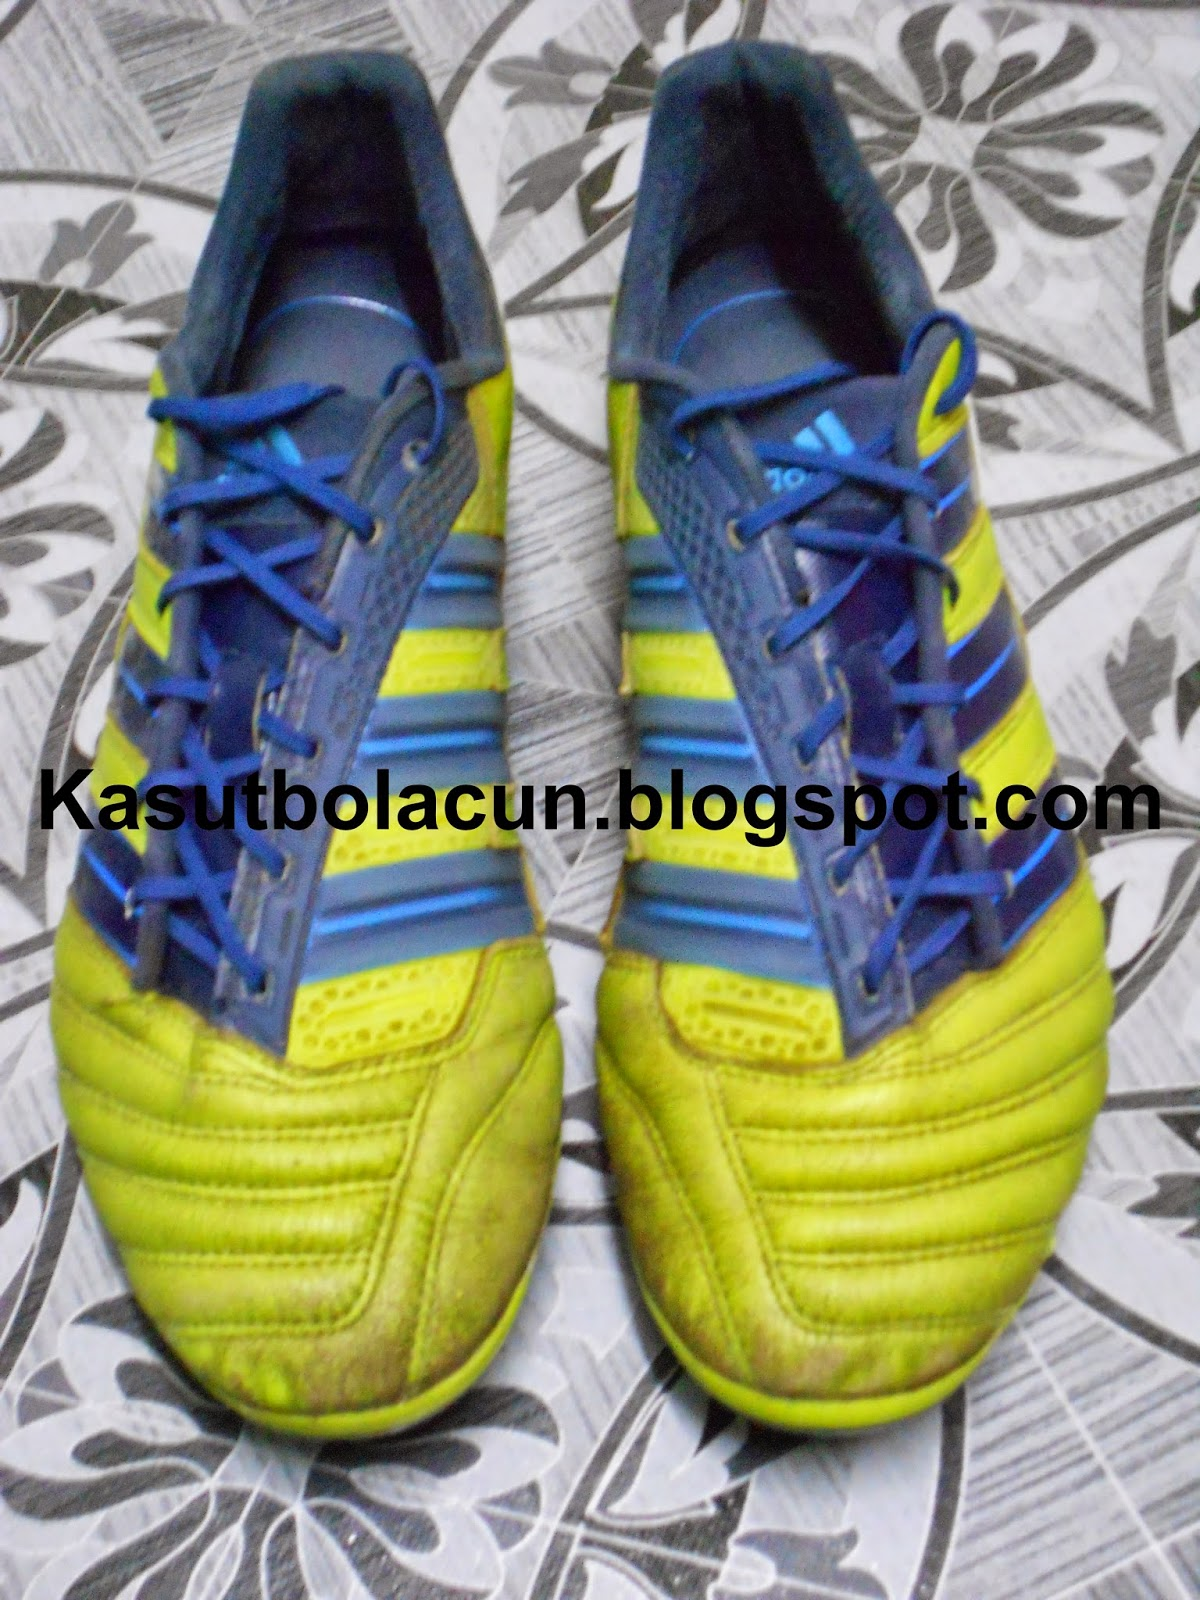 http://kasutbolacun.blogspot.com/2015/02/adidas-adipower-predator-fg.html